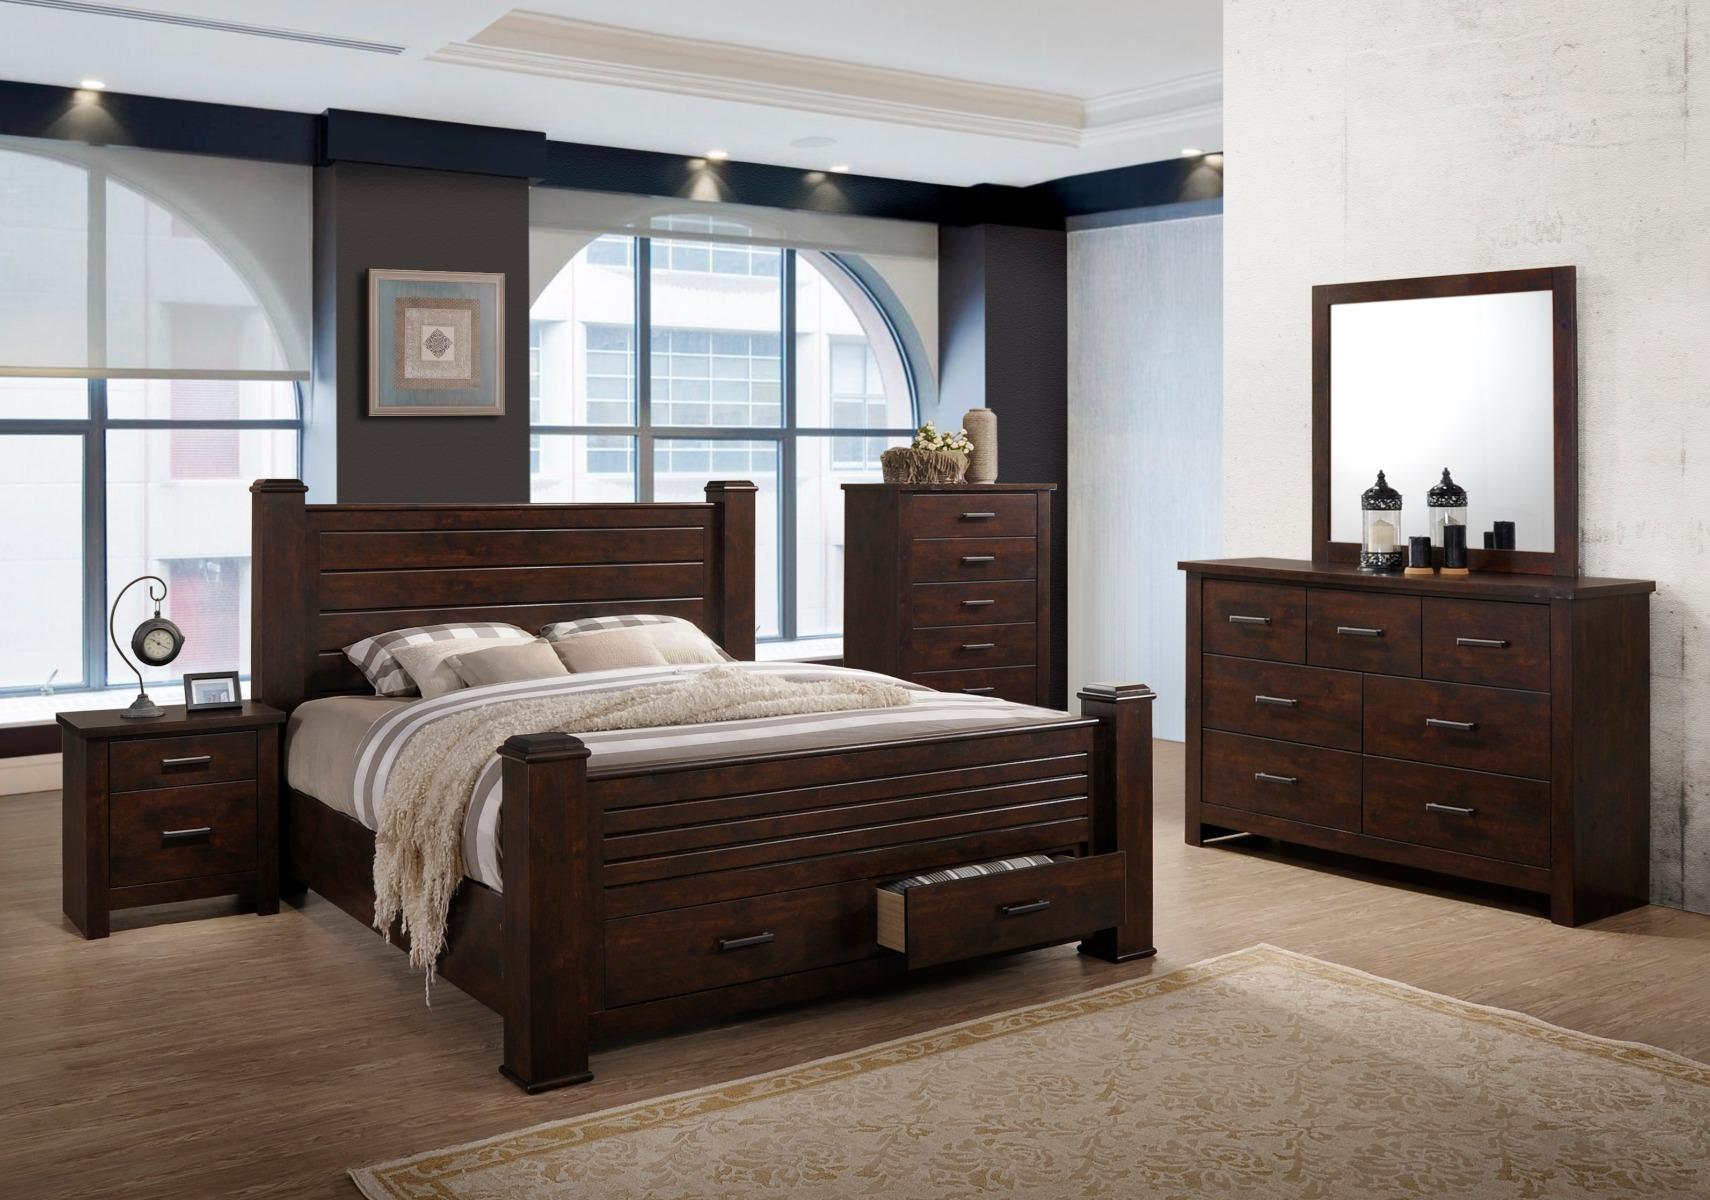 Myco Furniture Storage Bed Queen Photo